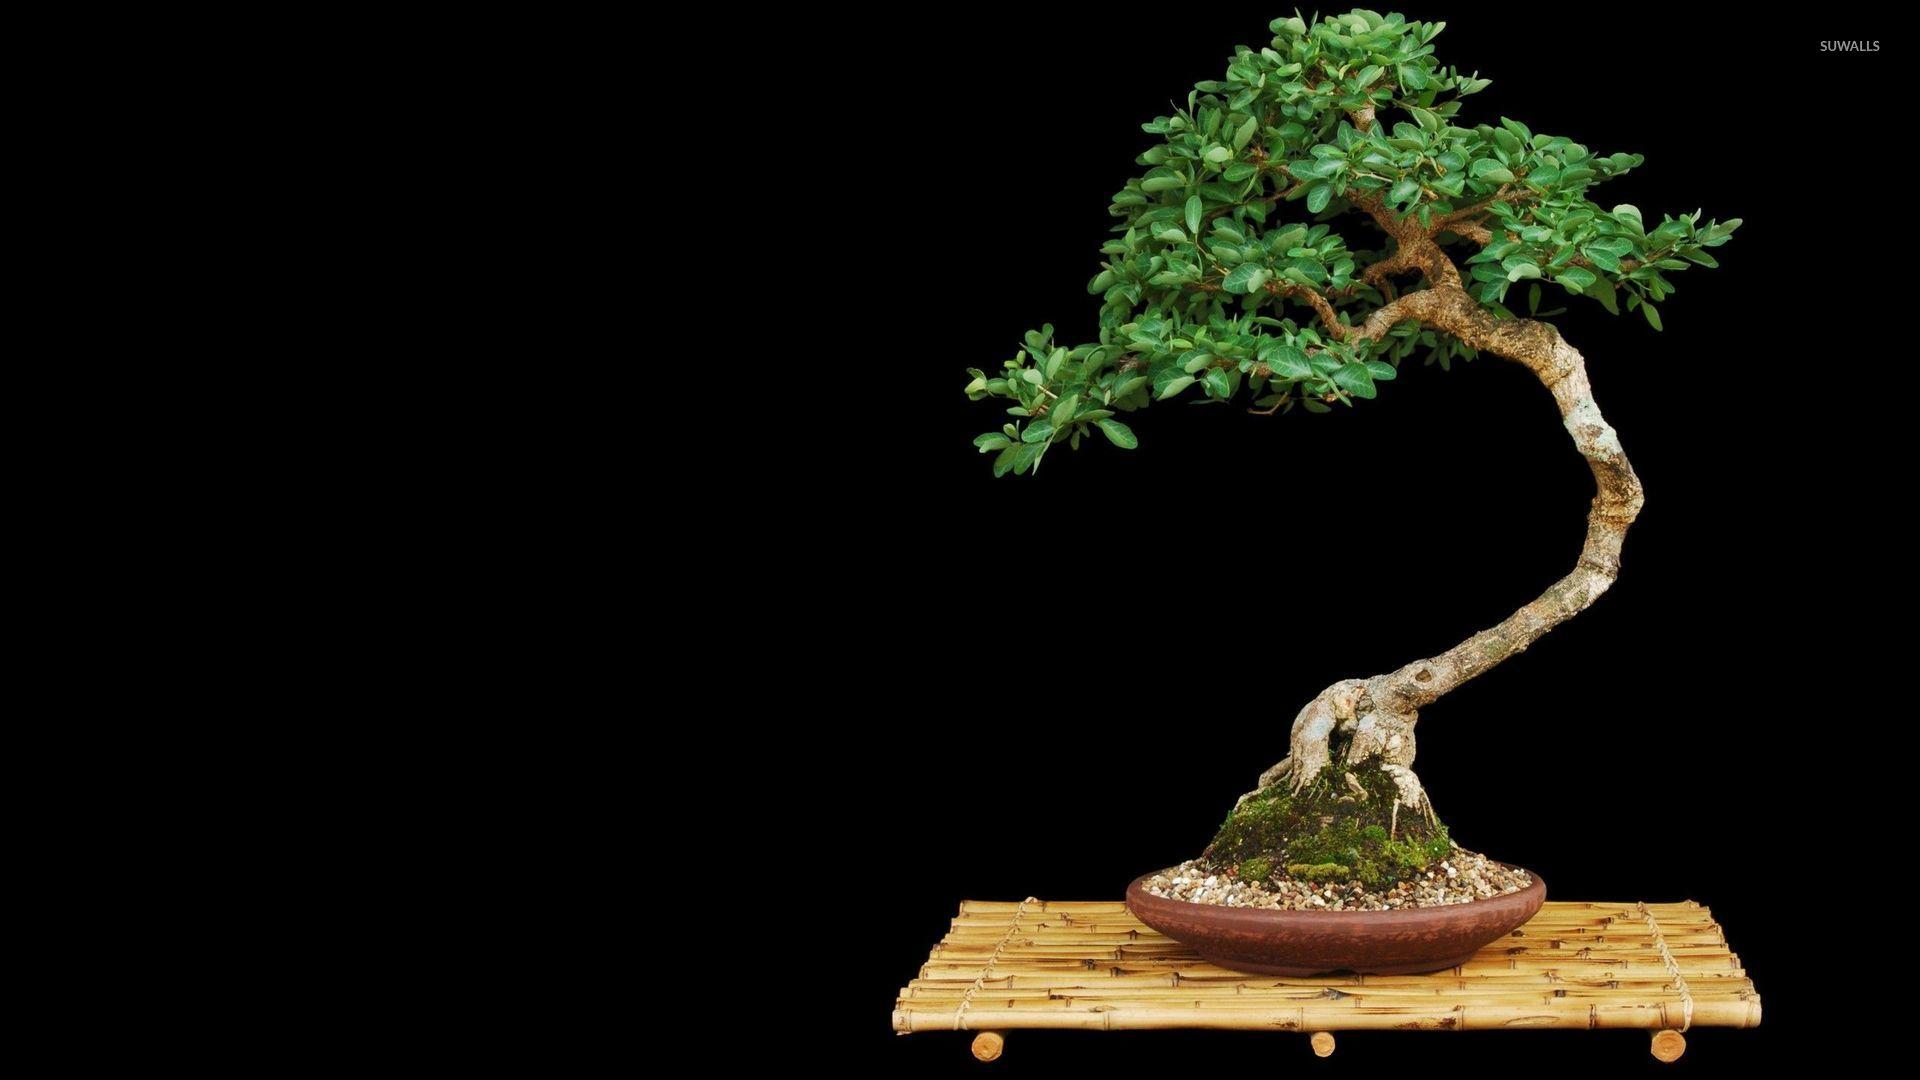 bonsai wallpaper photography wallpapers 11946